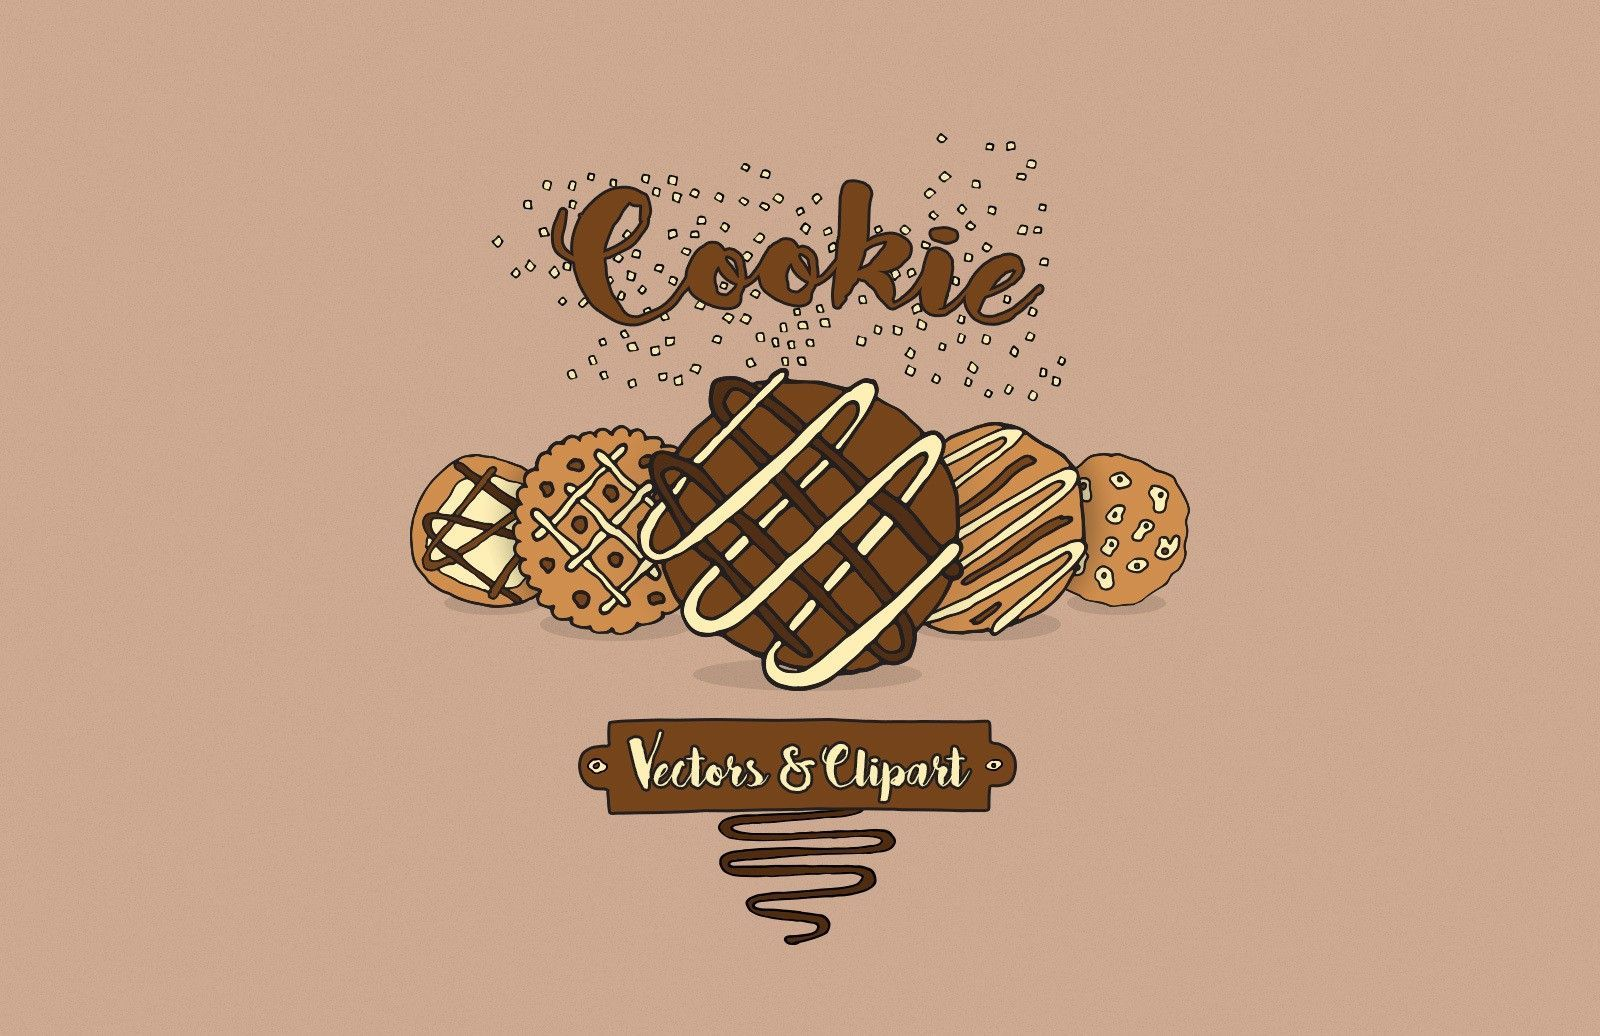 cookie vectors clipart bakery logo bakery logo design cookie vector cookie vectors clipart bakery logo